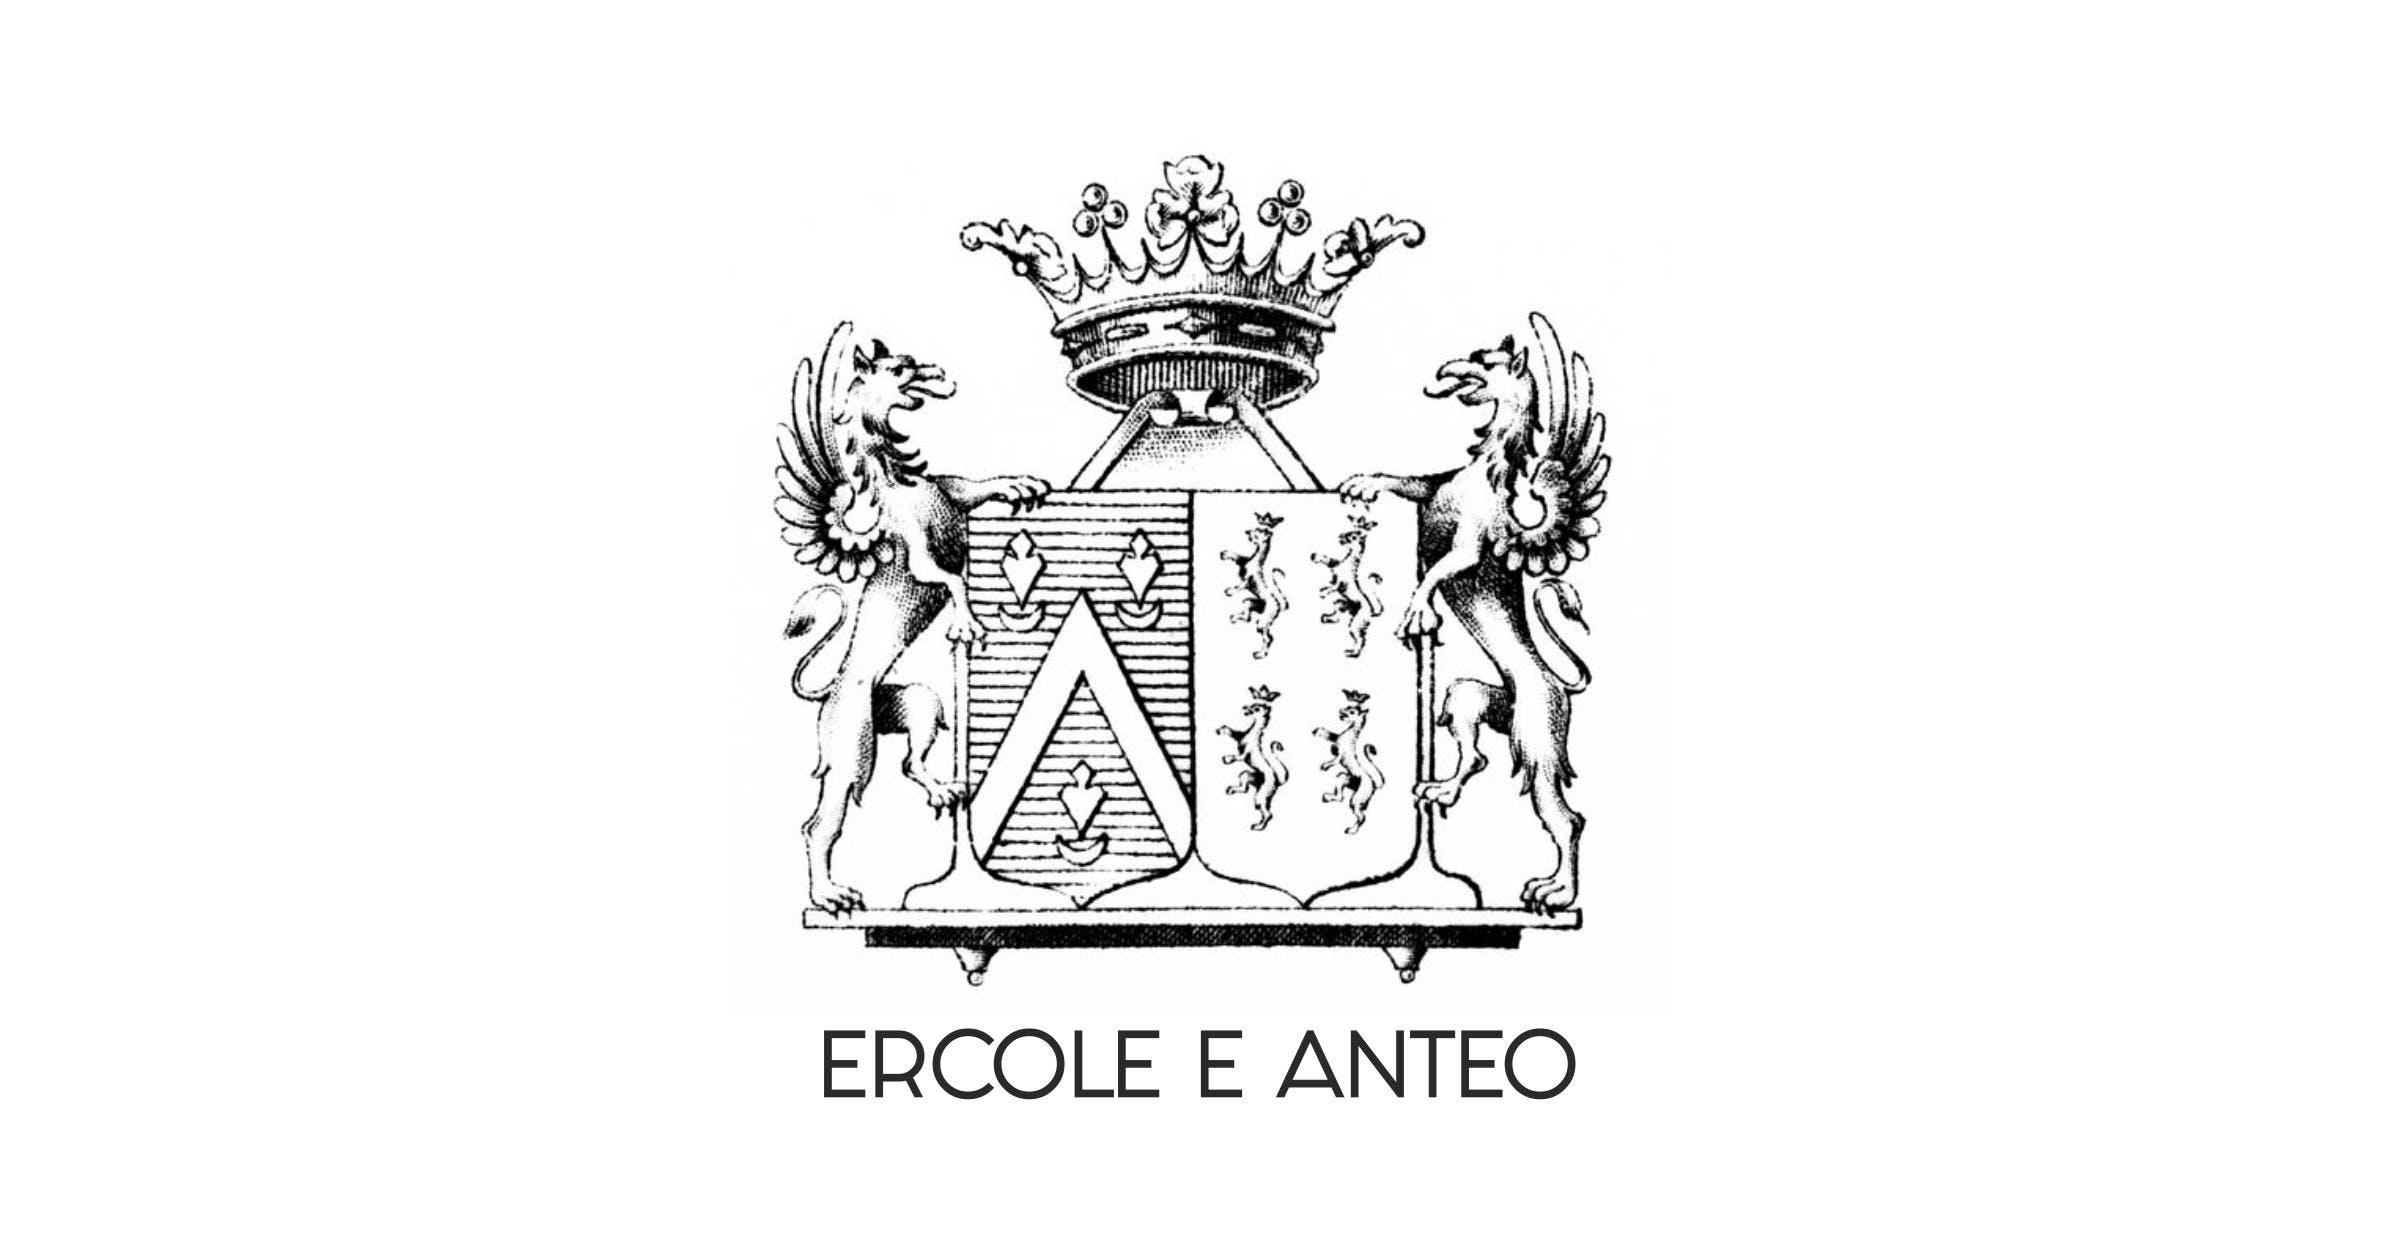 ERCOLE E ANTEO - (8€/5€ rid)